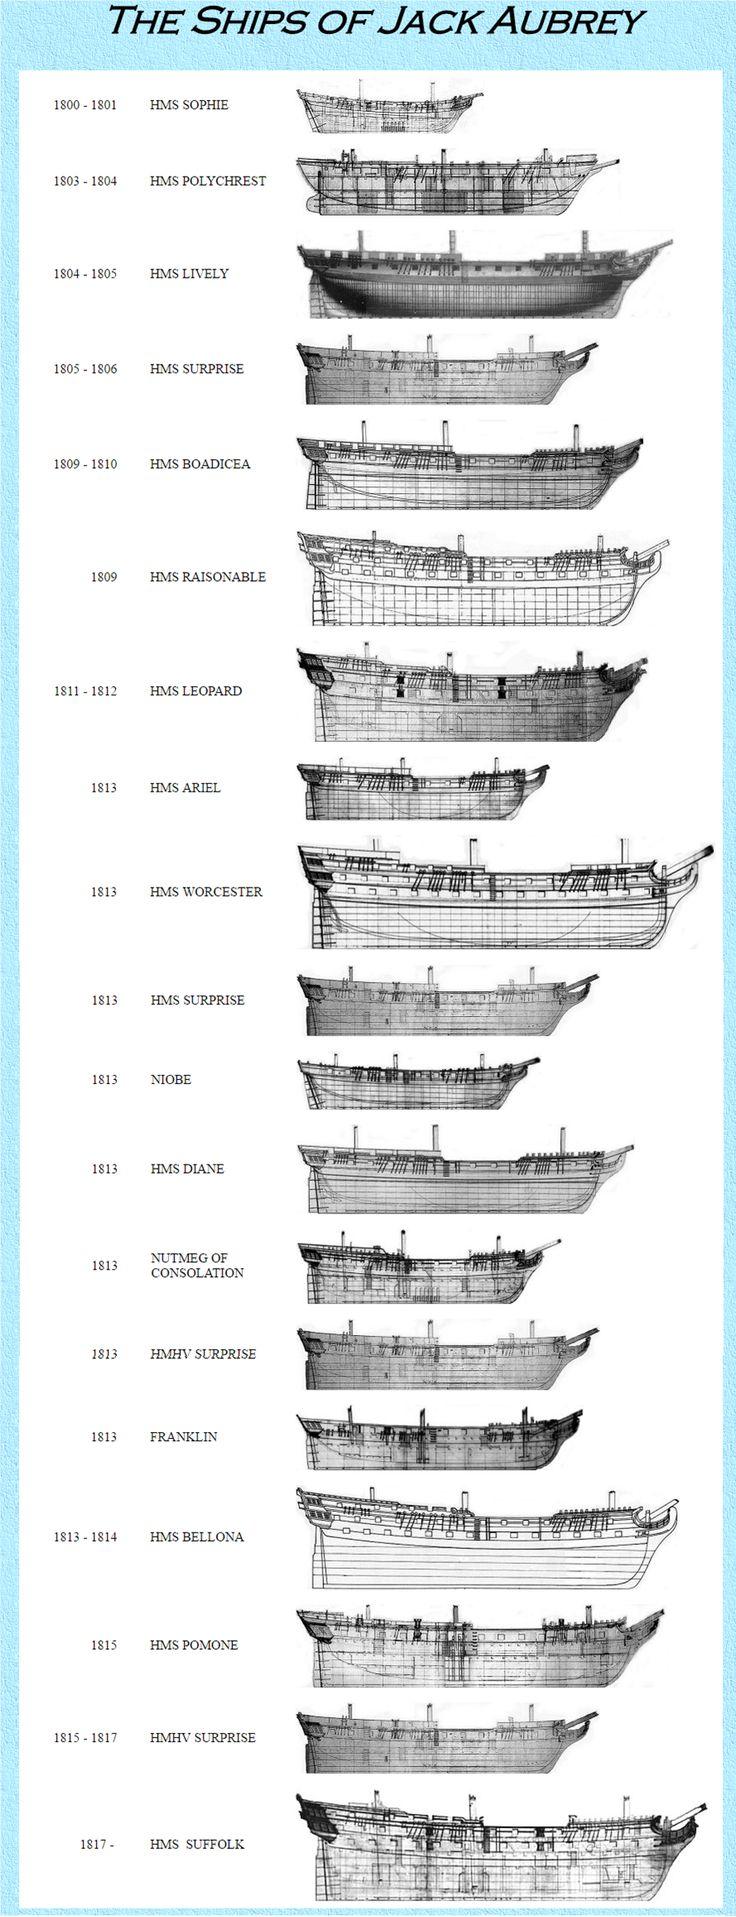 Ships of Jack Aubrey